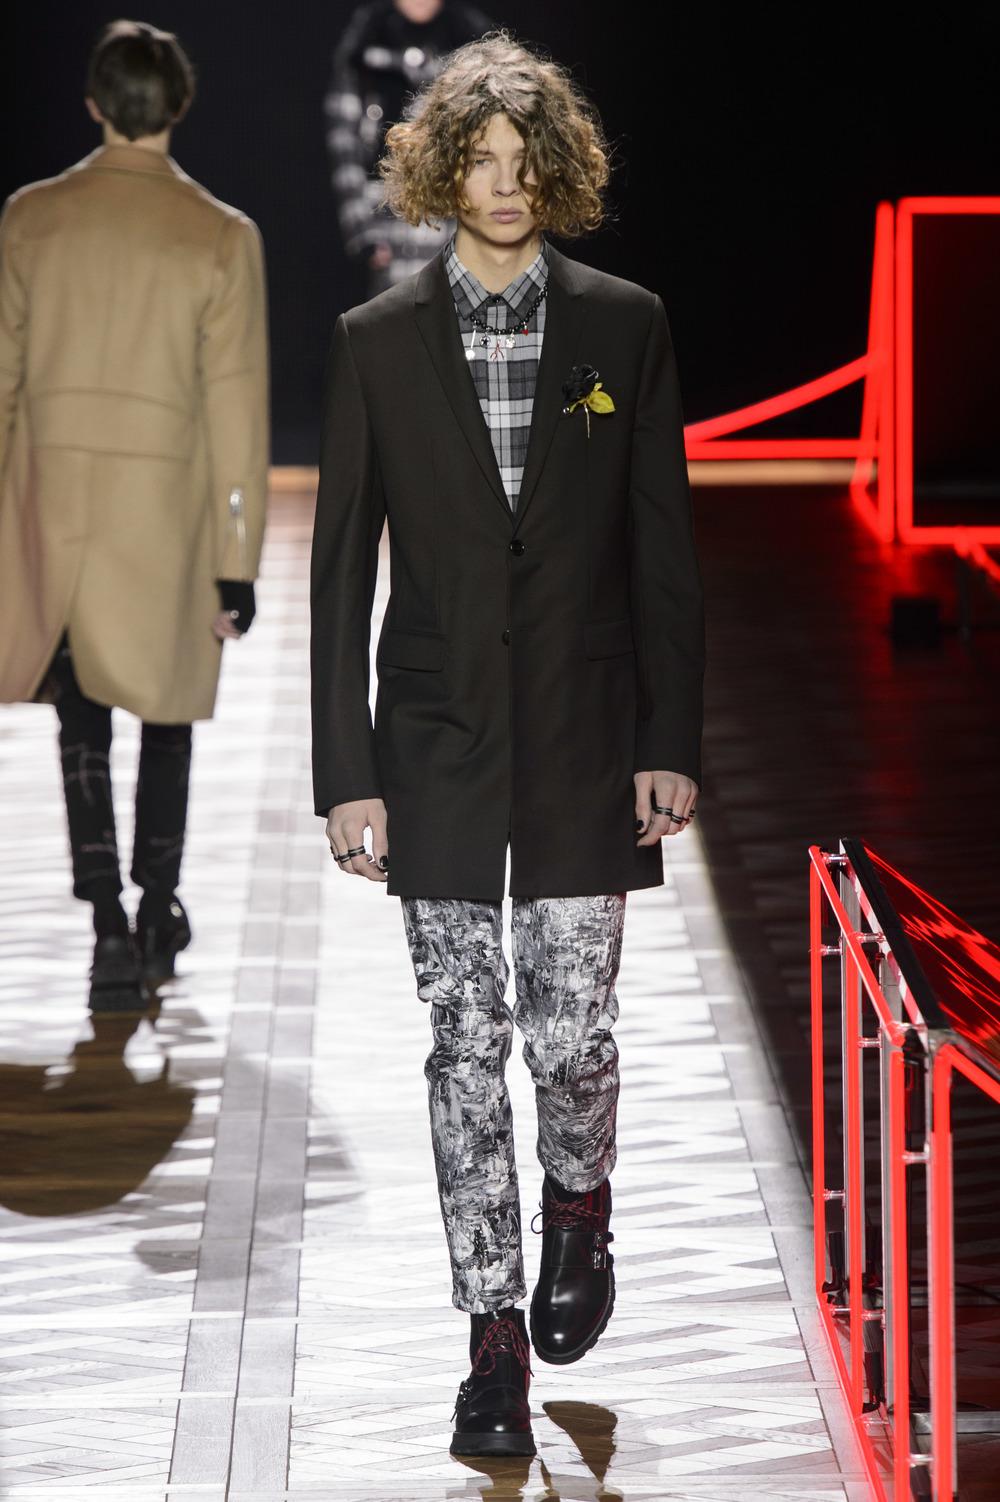 Dior_Homme_Hiver2016-17_look_36.JPG